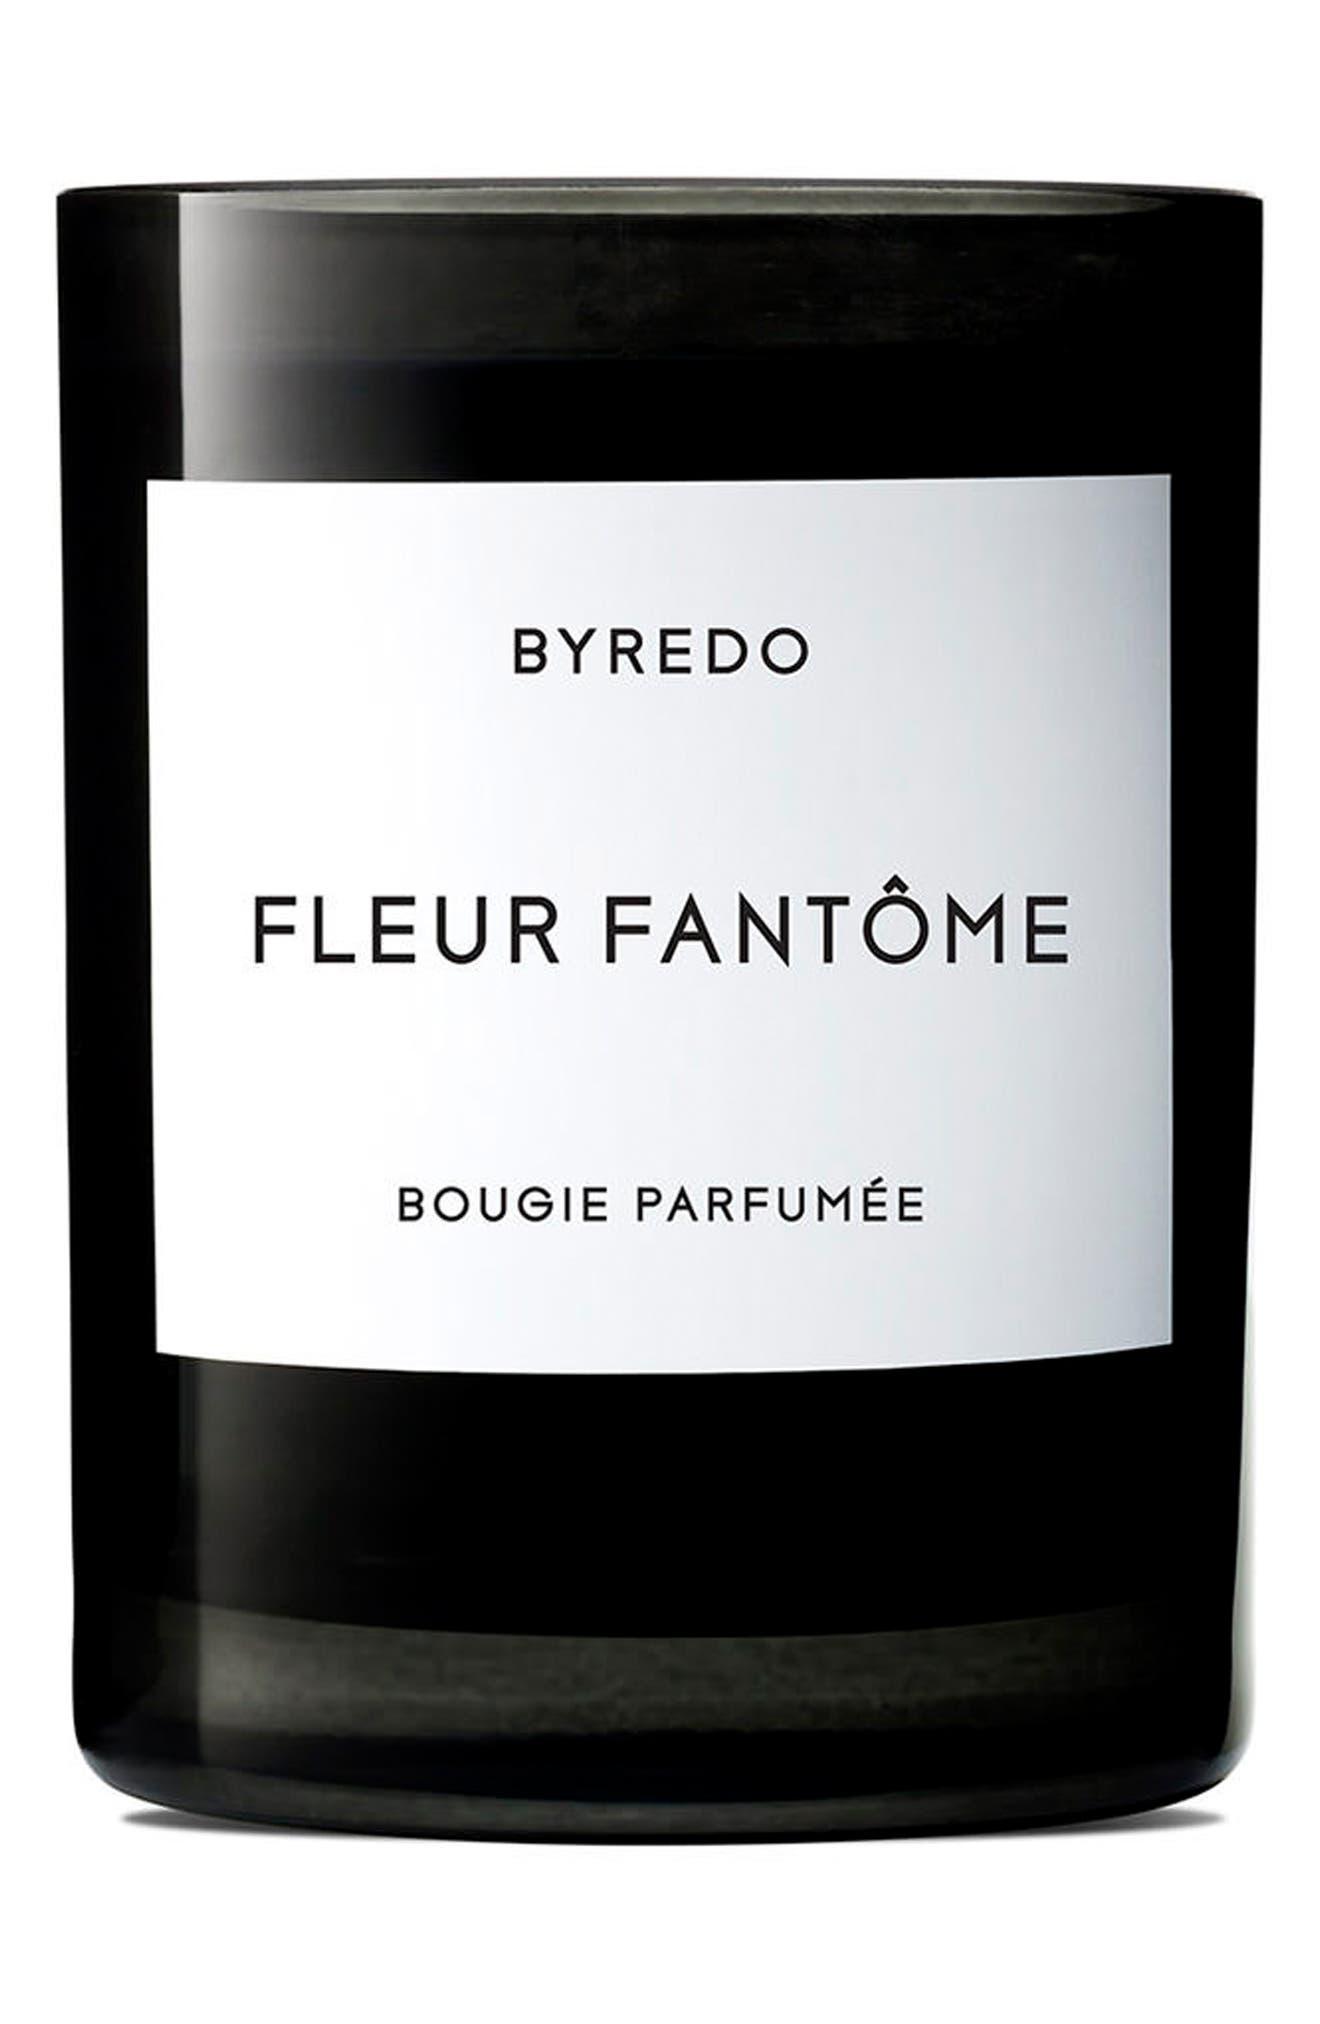 BYREDO Fleur Fantôme Candle